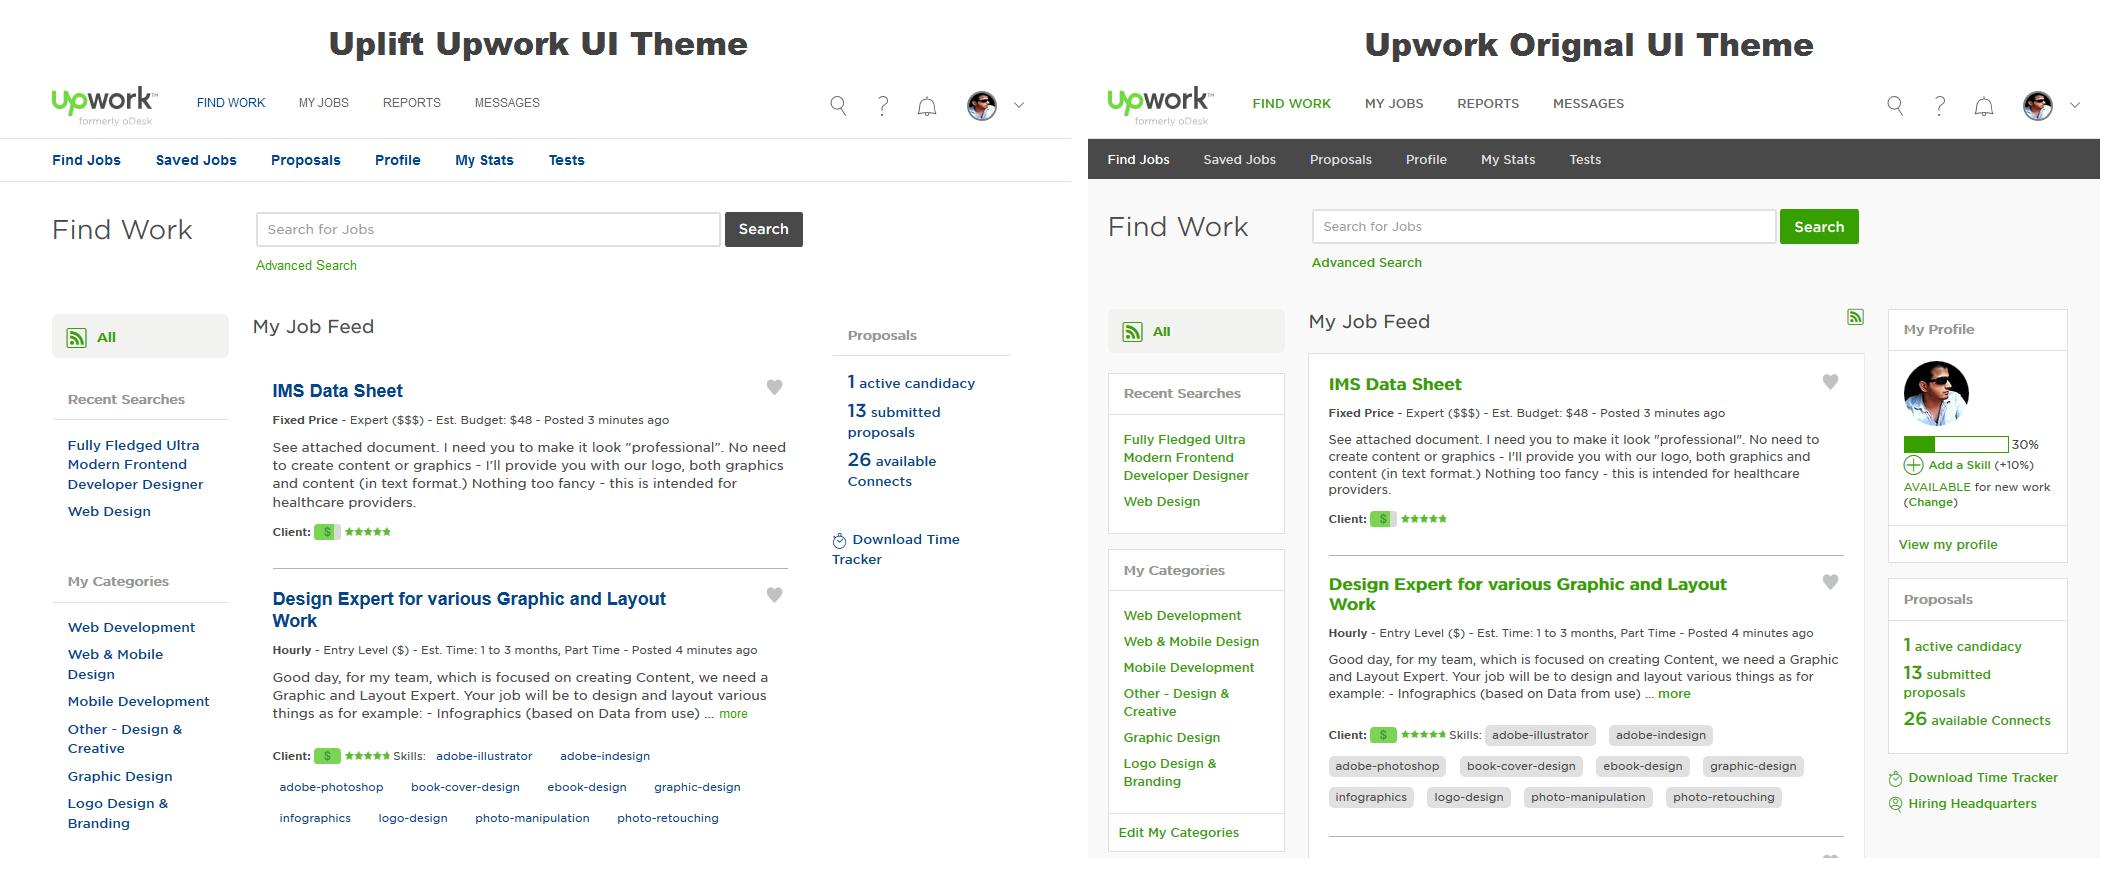 Uplift_Upwork_Styles_Theme.png